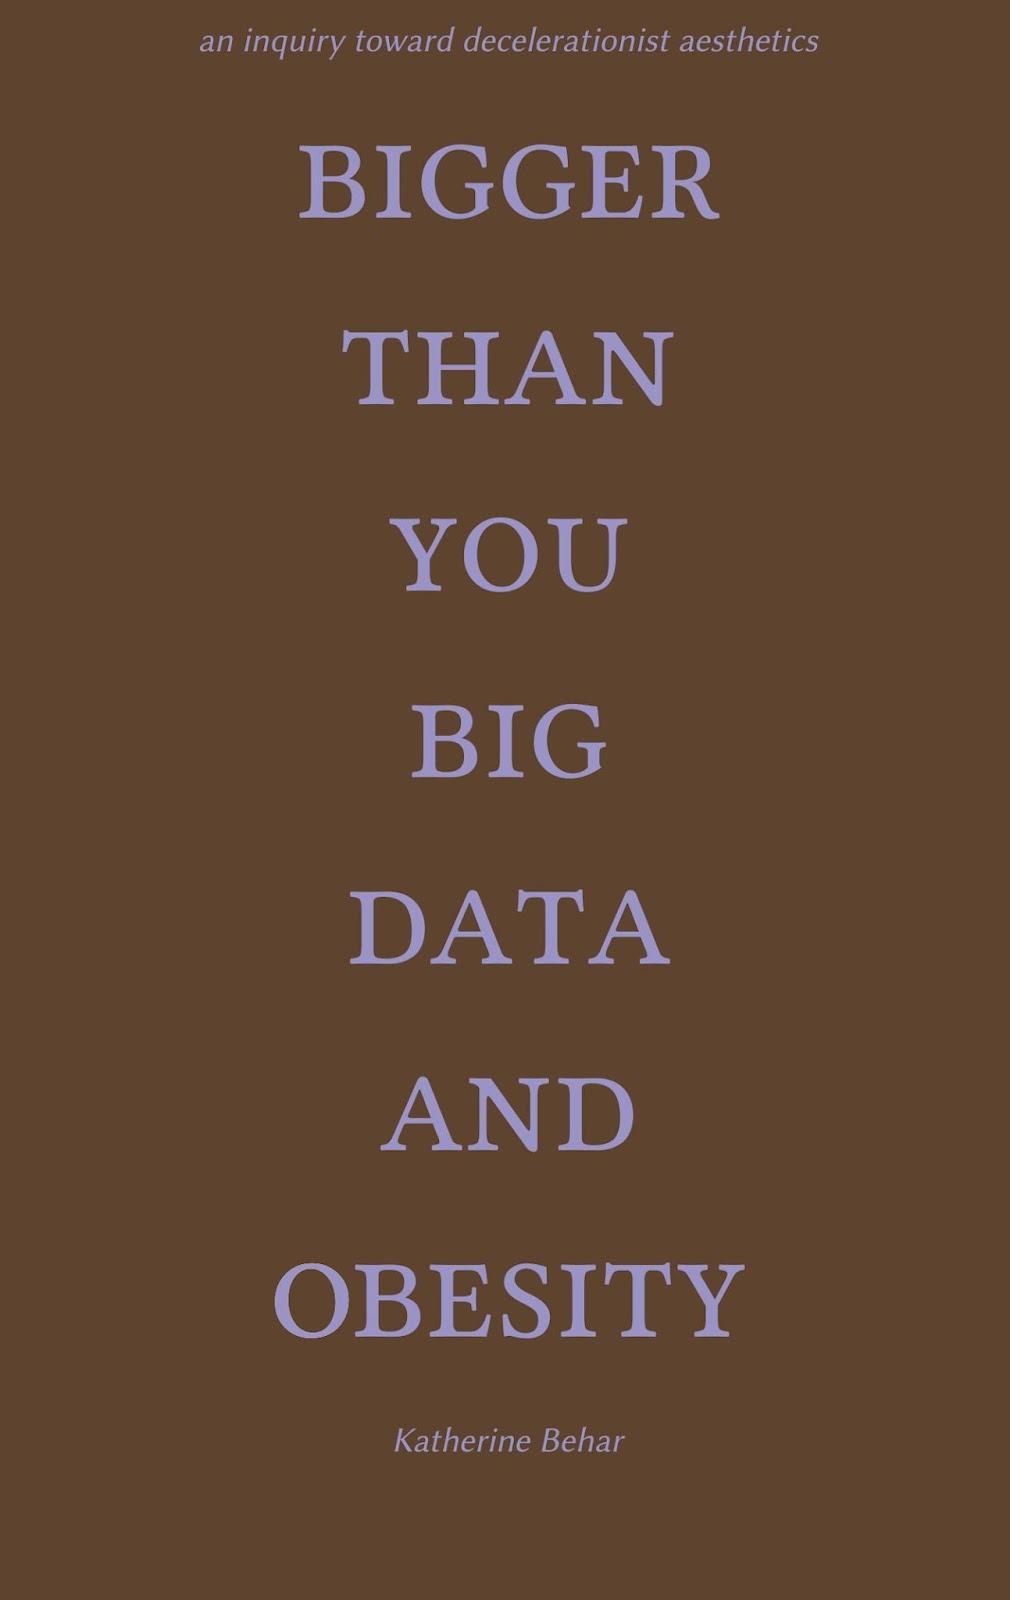 Bigger Than You Big Data And Obesity